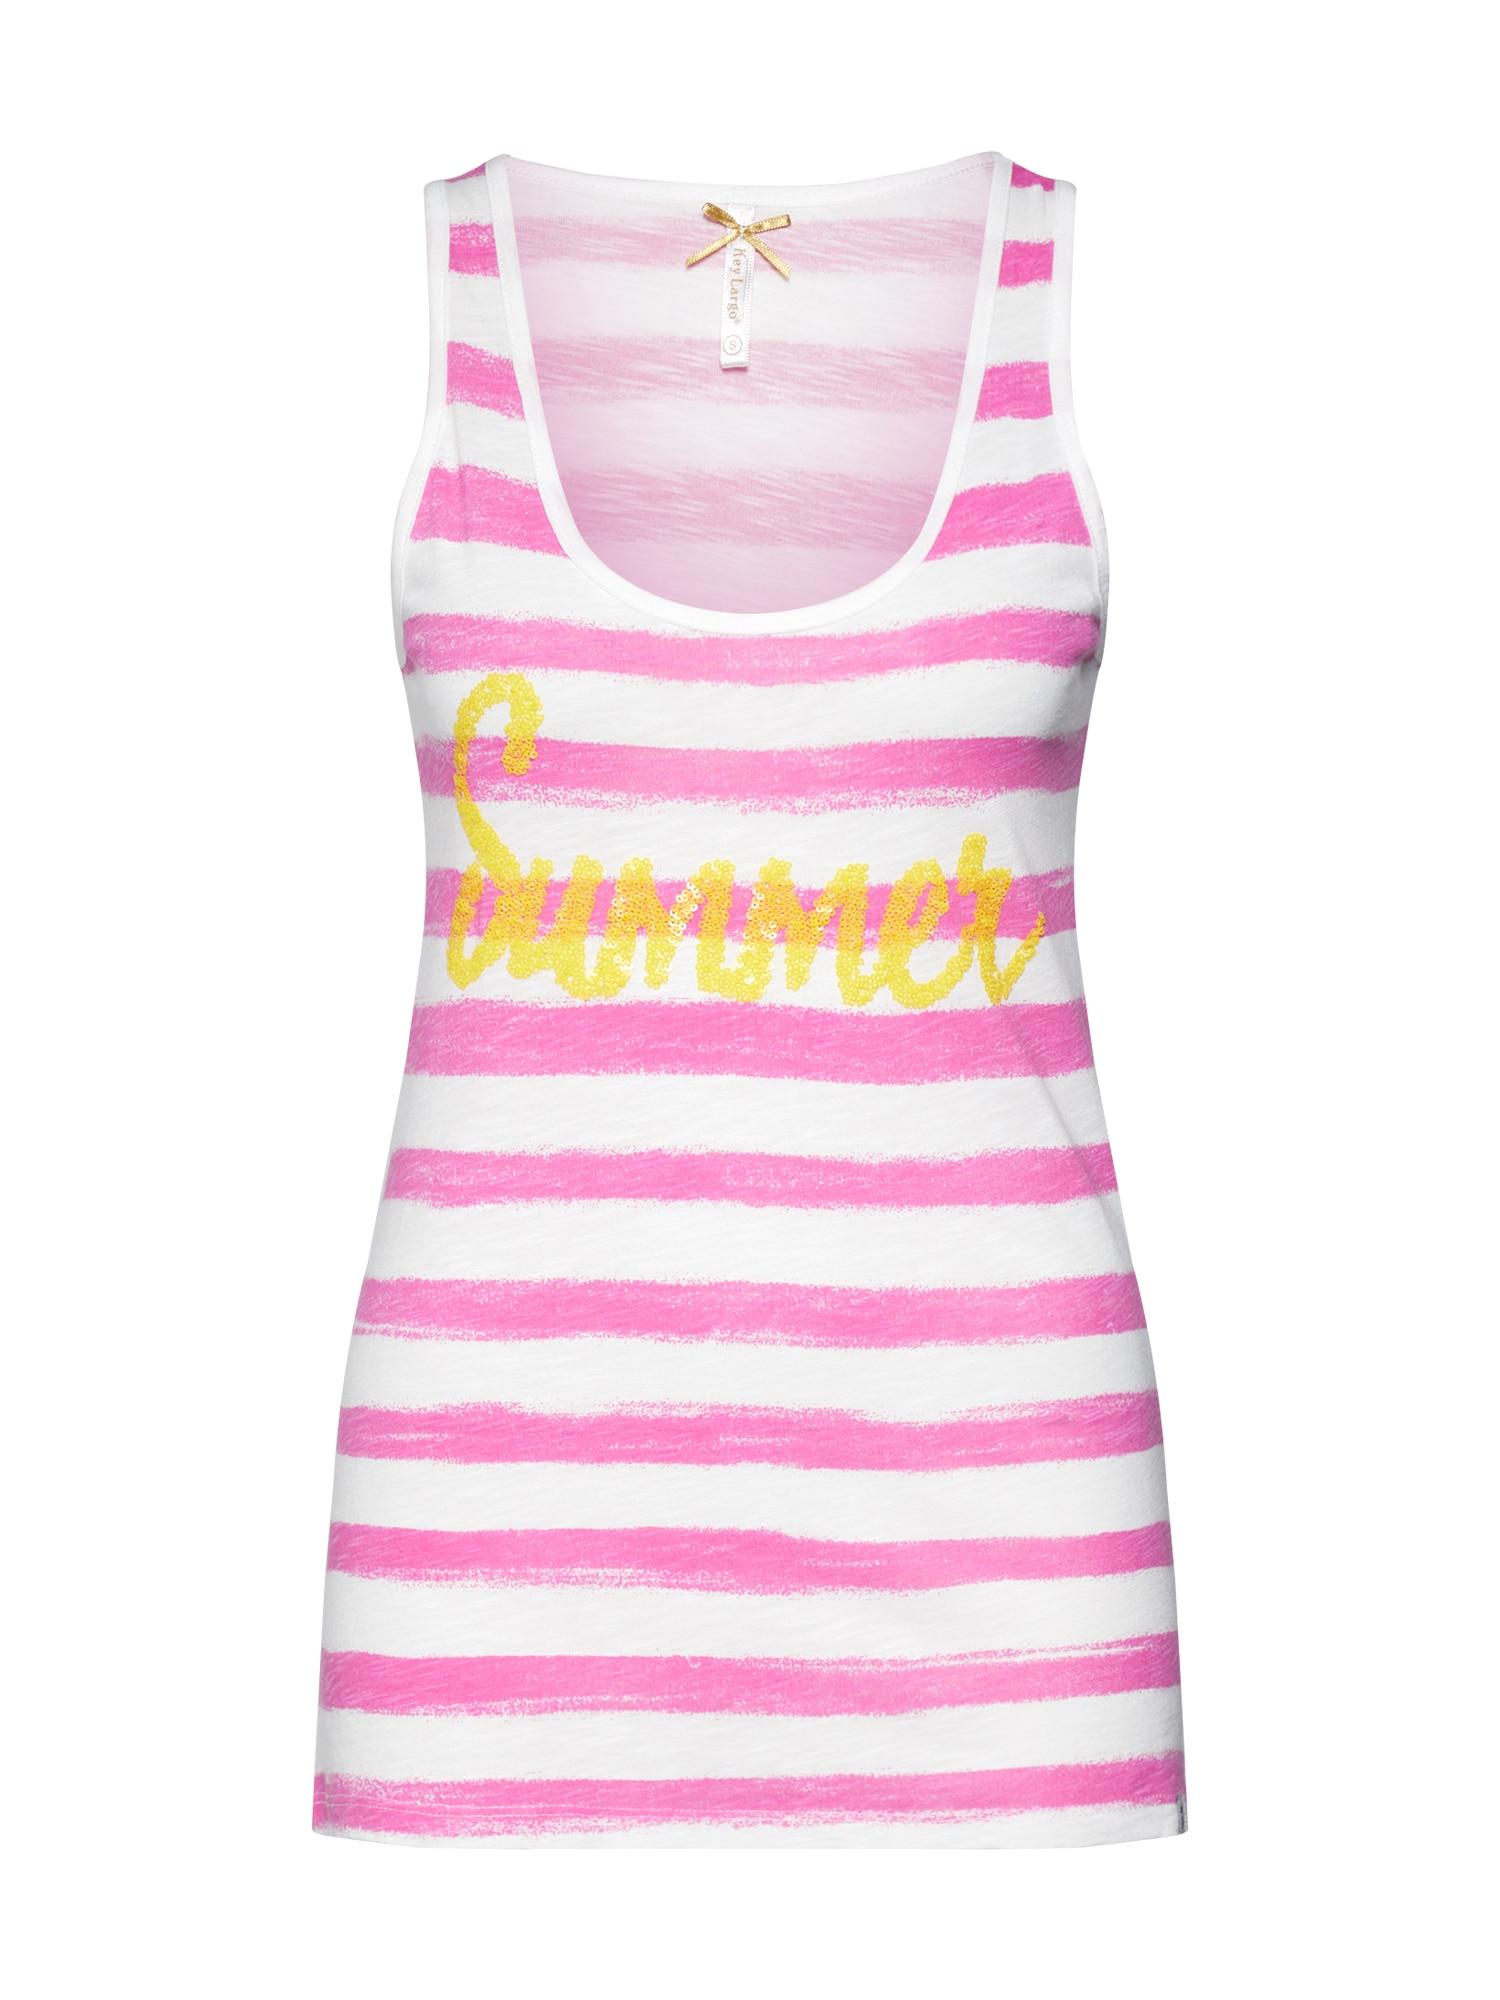 Top SUMMER pink Key Largo